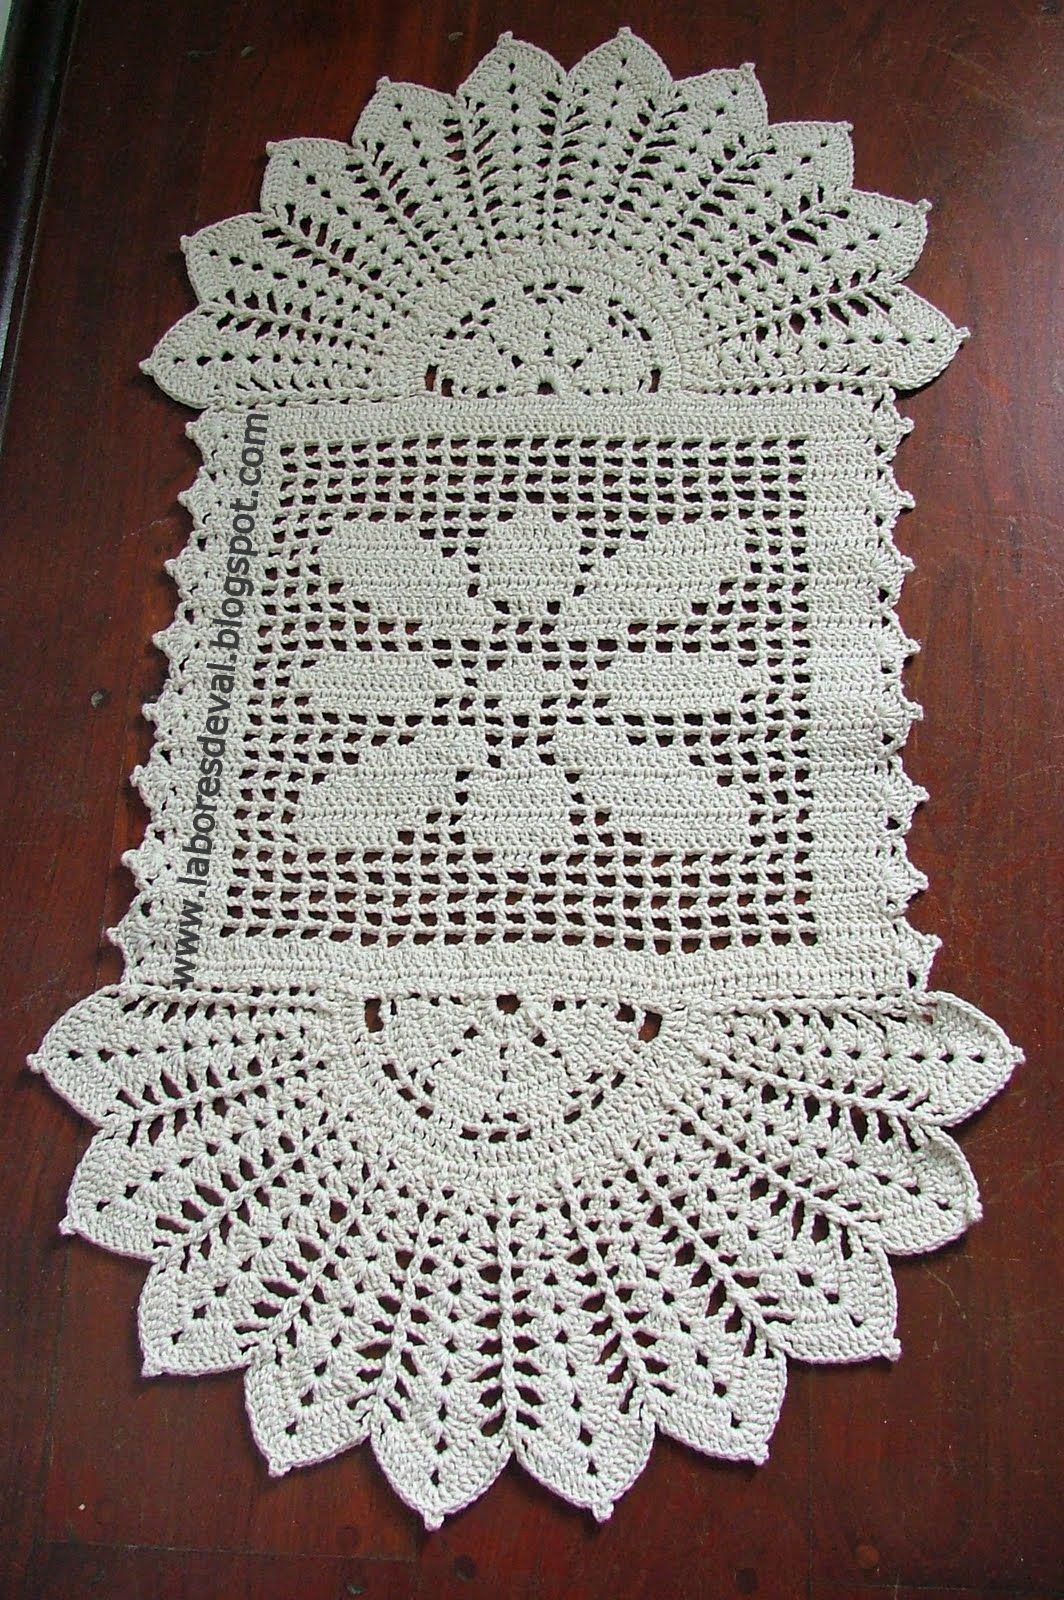 Pin By Marina Teixeirajw On Croch Cozinha E Banheiro Pinterest Oval Crochet Doily Diagram Celtic Heart Runner In Ebook